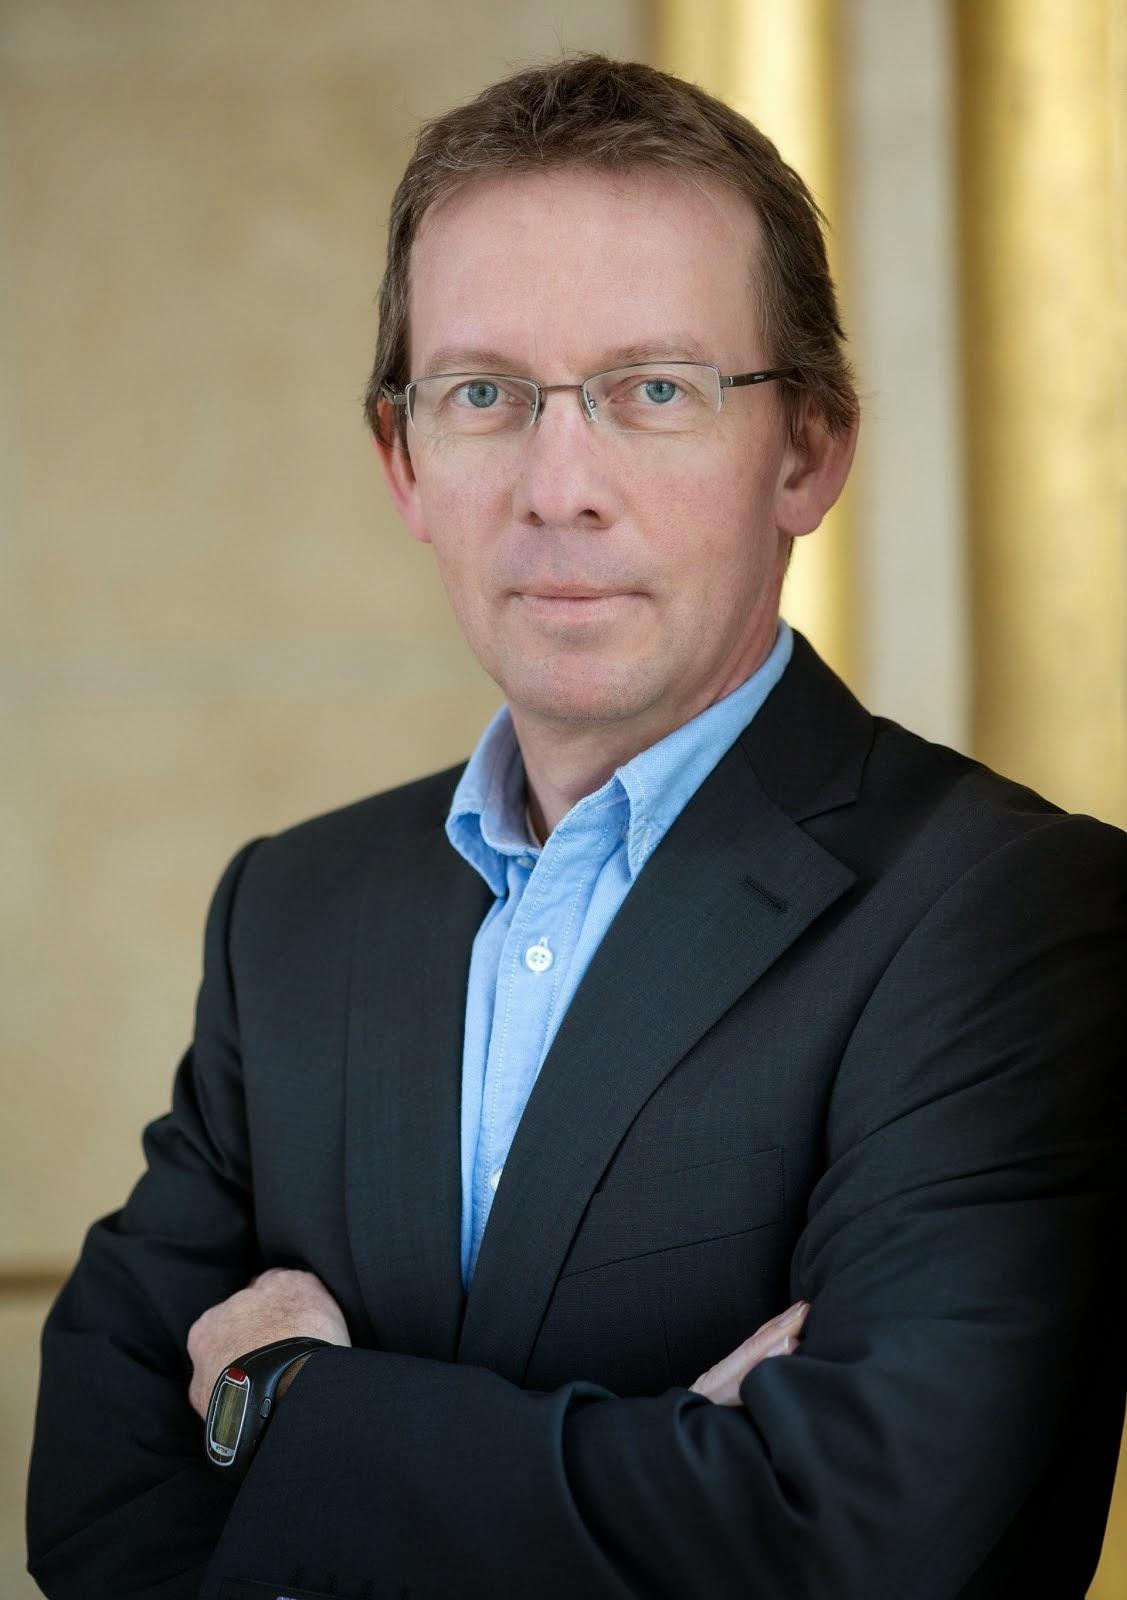 Andreas Braun <br> Journalist, Buchautor, Trader<br>braun@b-mc.de